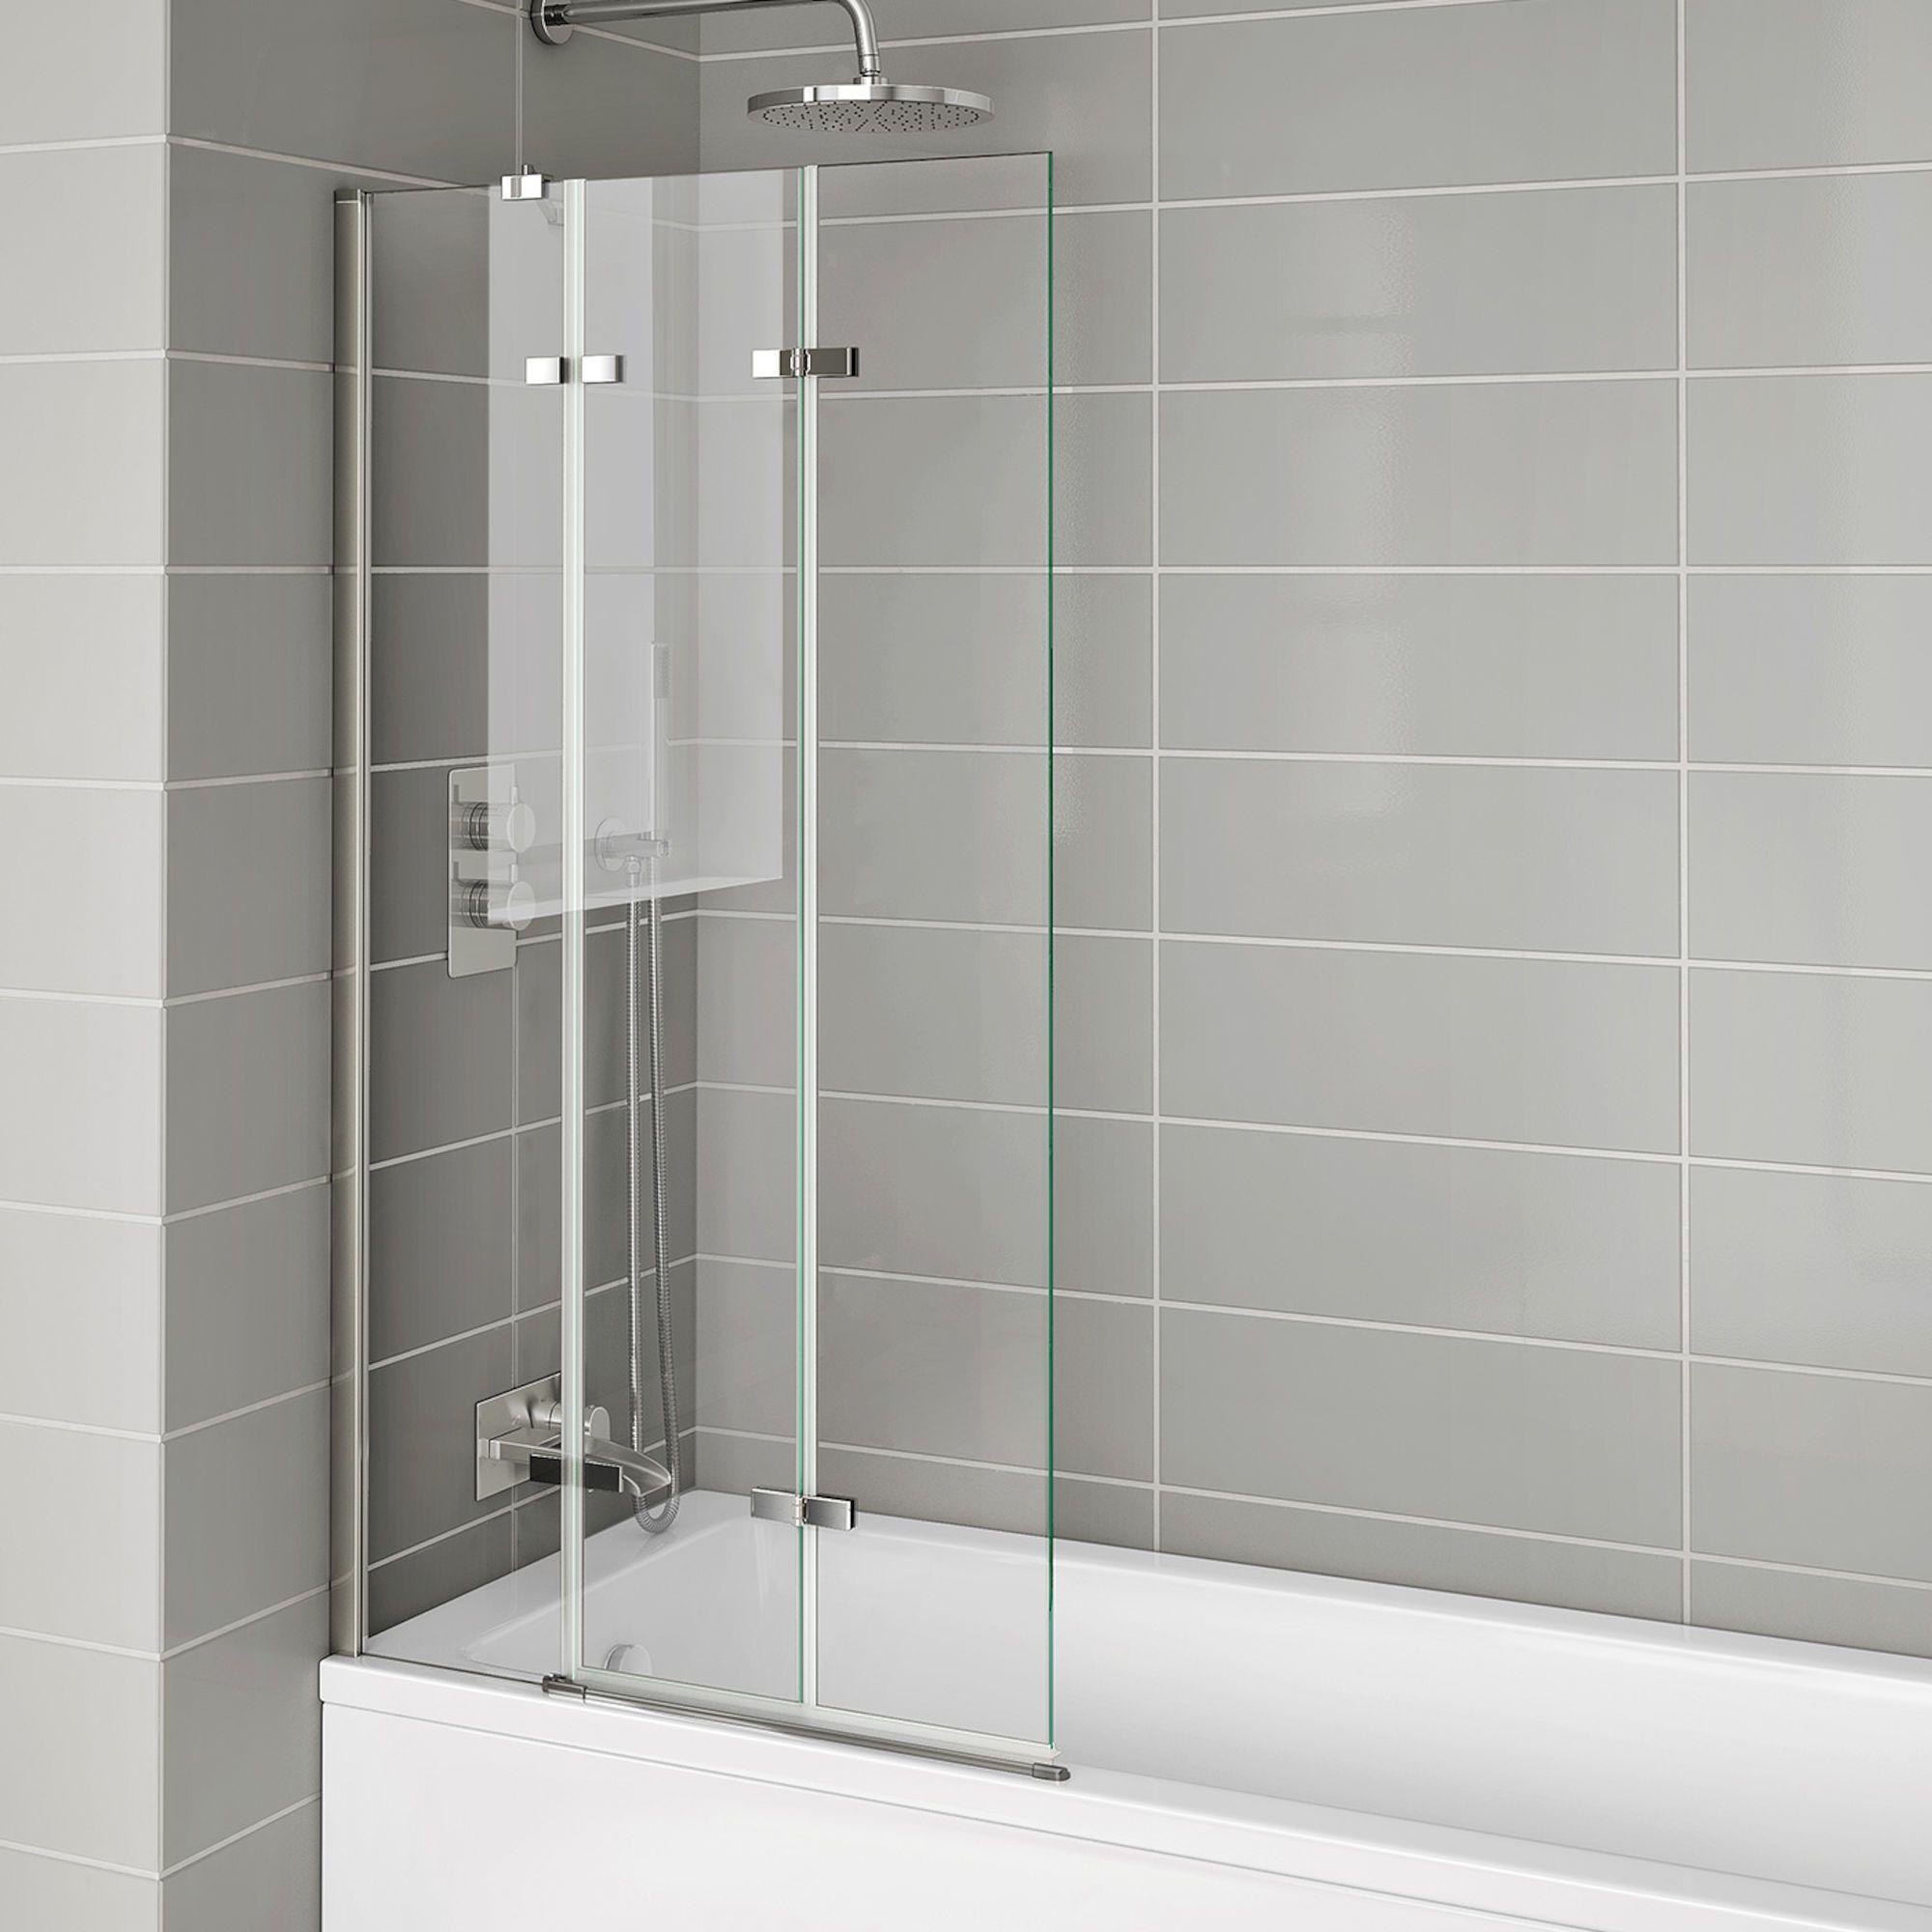 6mm Easyclean Folding Bath Screen Left Hand Bath Shower Screens Bath Screens Bathroom Shower Panels